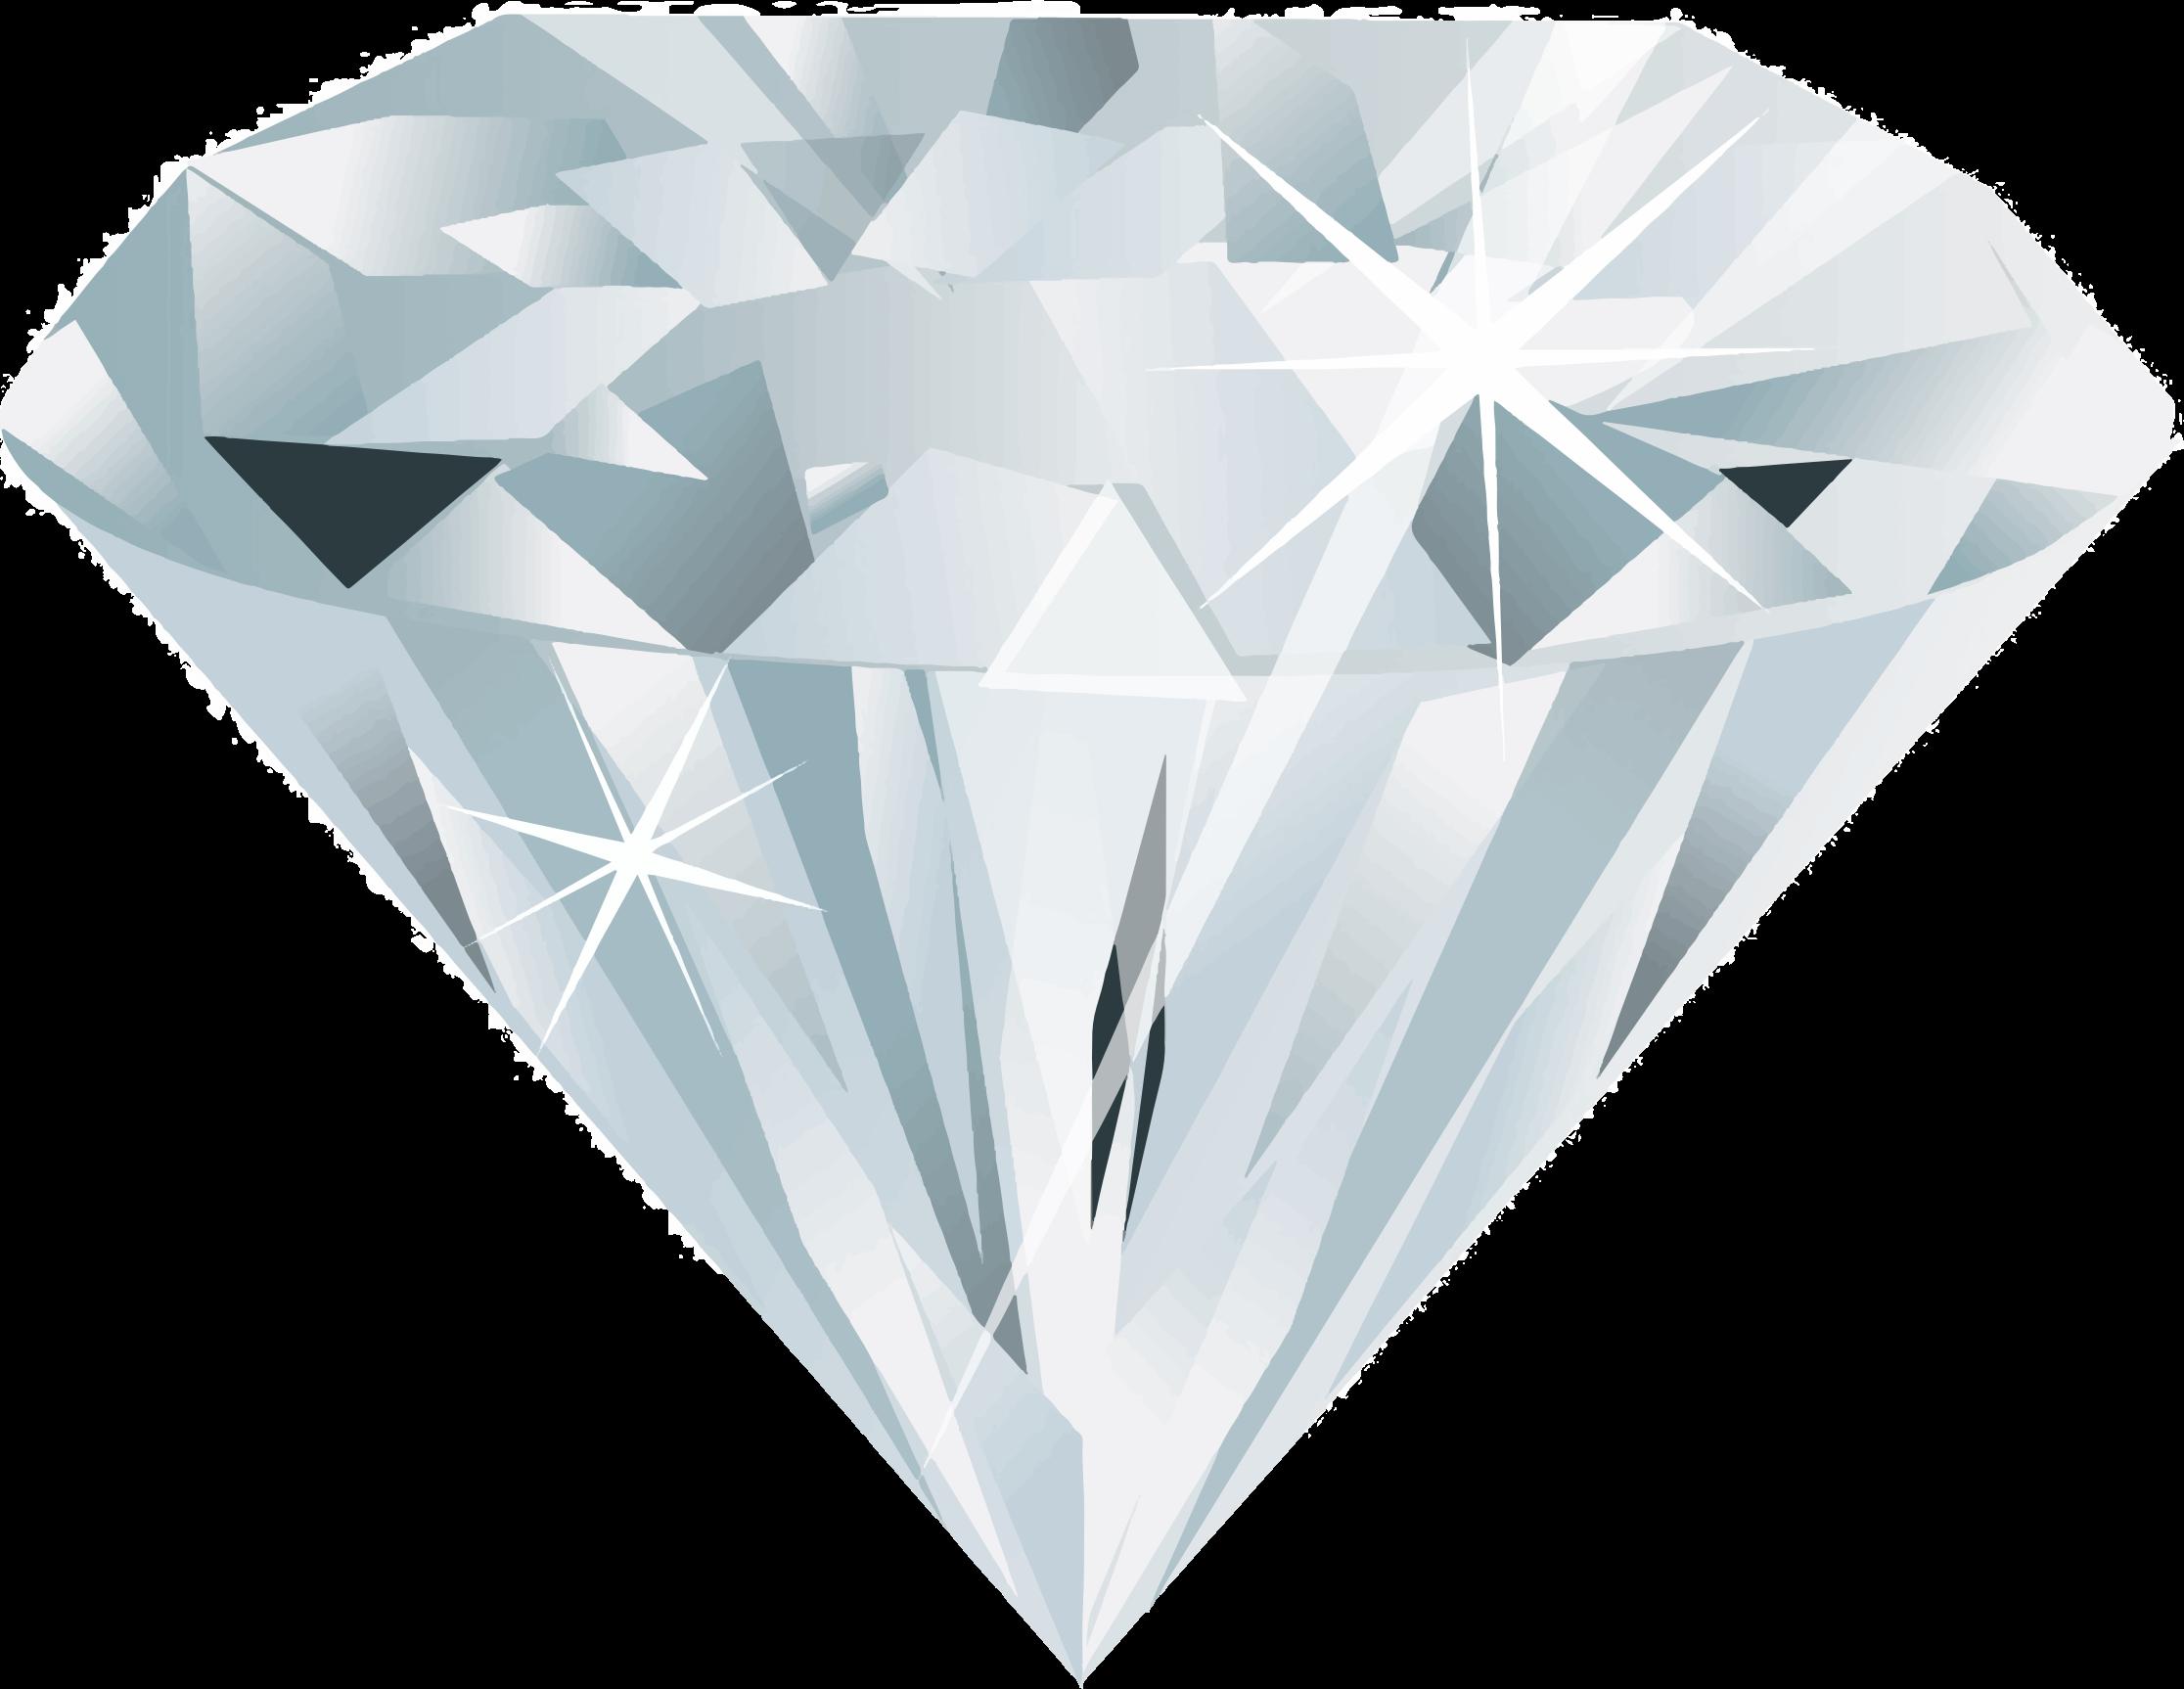 Big image png. Diamond clipart dimand